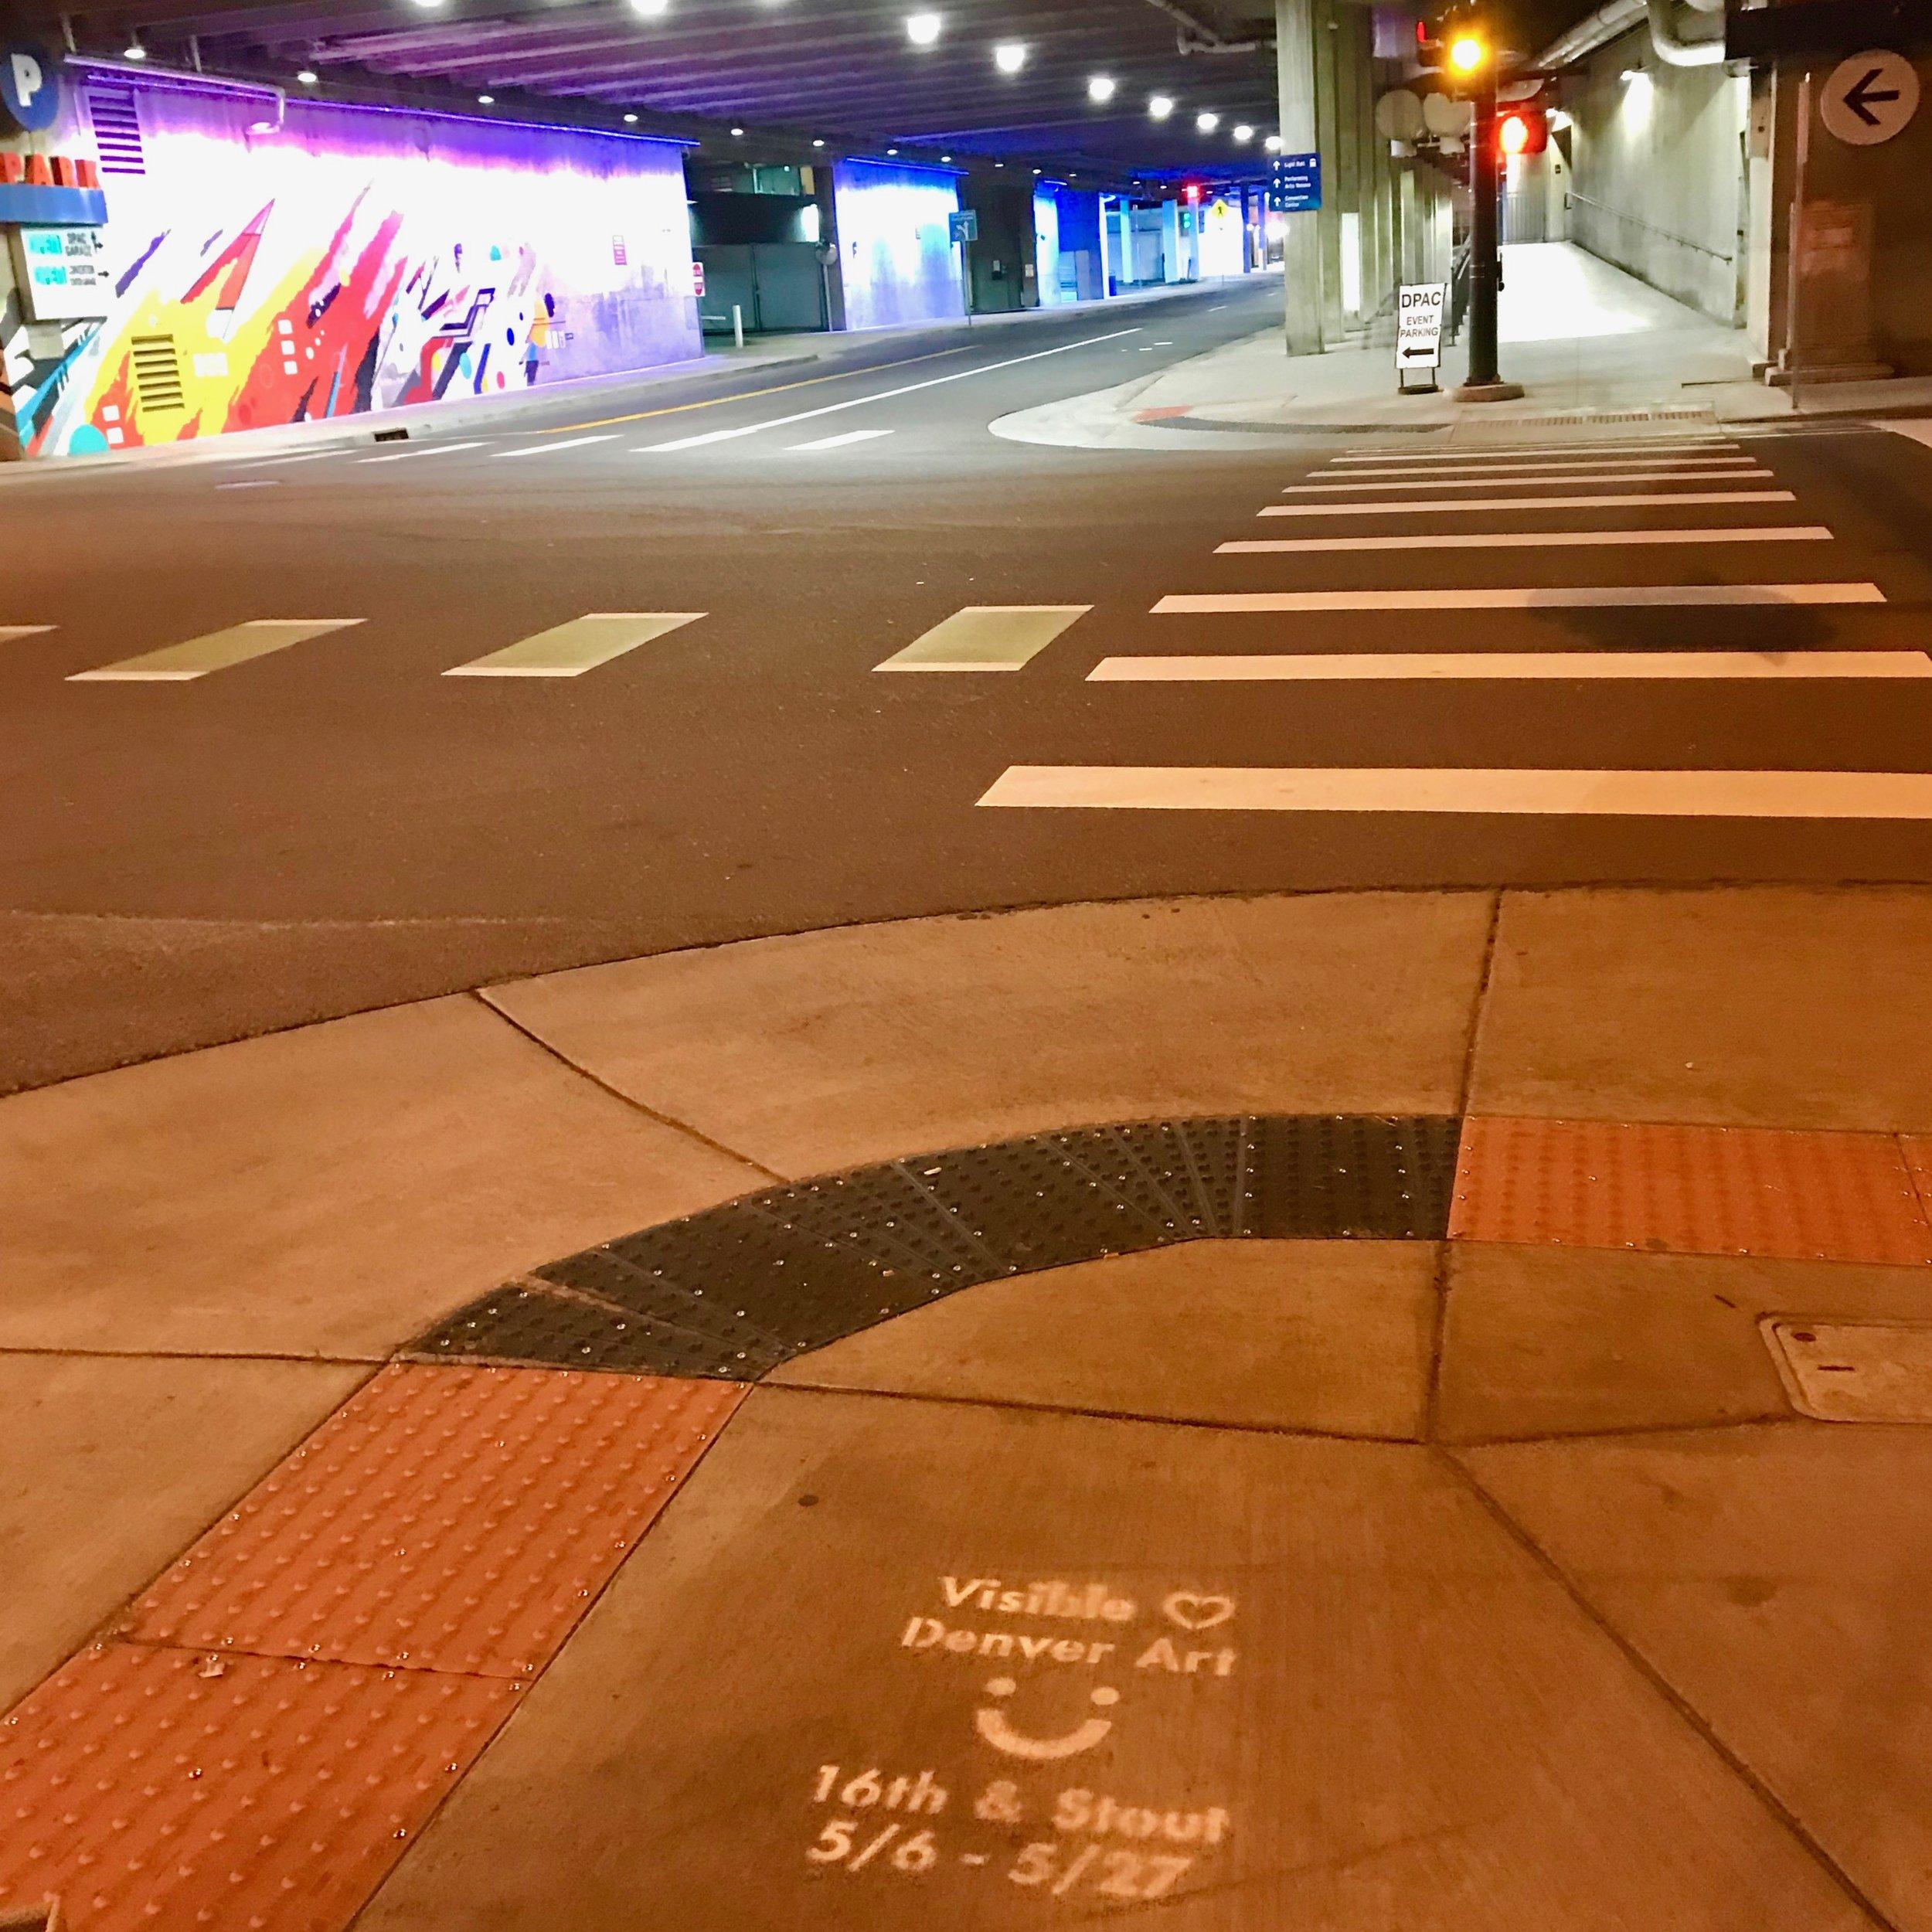 2019_5_10_VM1_Visible_Denver_061.jpg